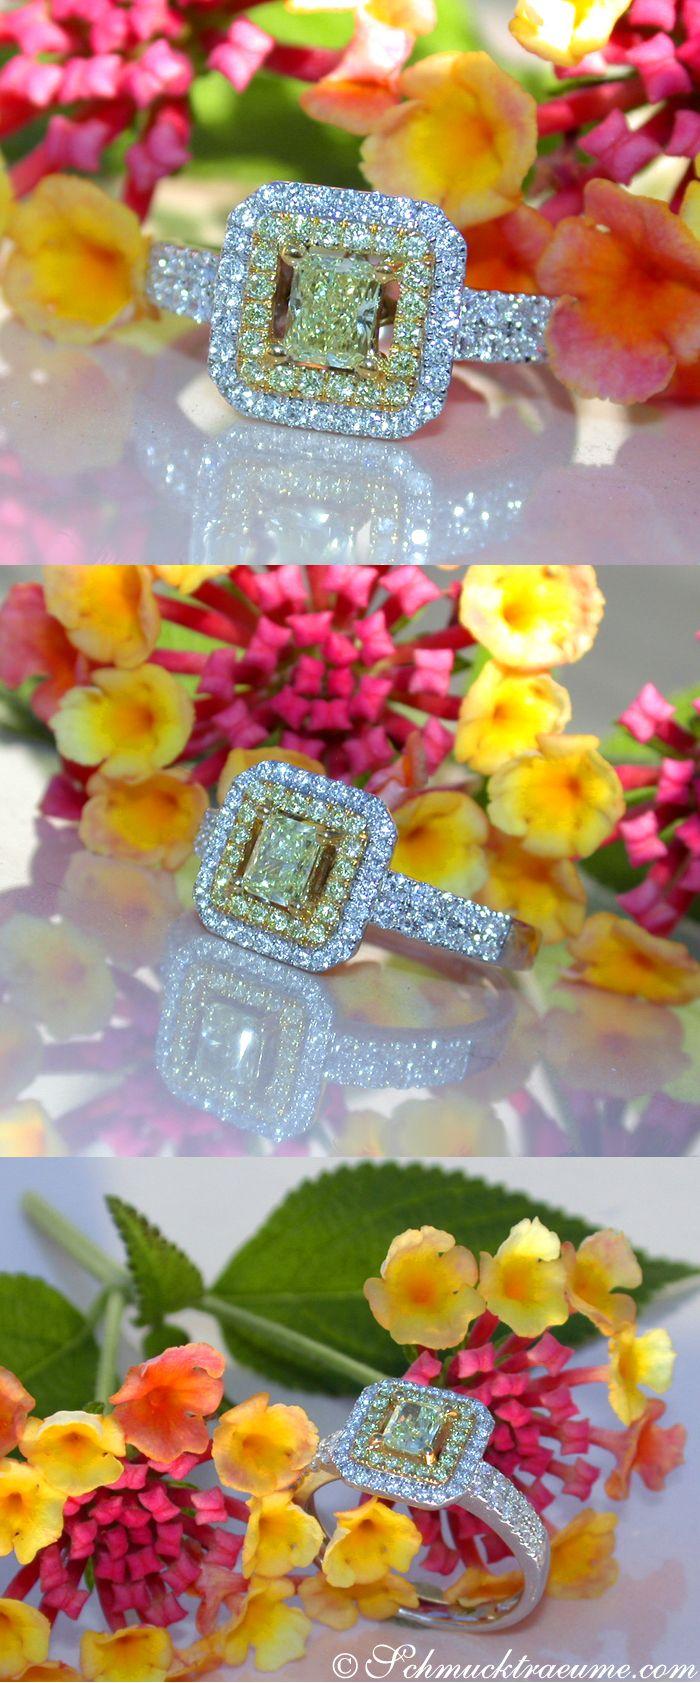 Picture Perfect Fancy Yellow & White Diamond Ring, 0.77 ct. Whitegold 18k - Like: https://www.facebook.com/Noble-Juwelen-150871984924926/